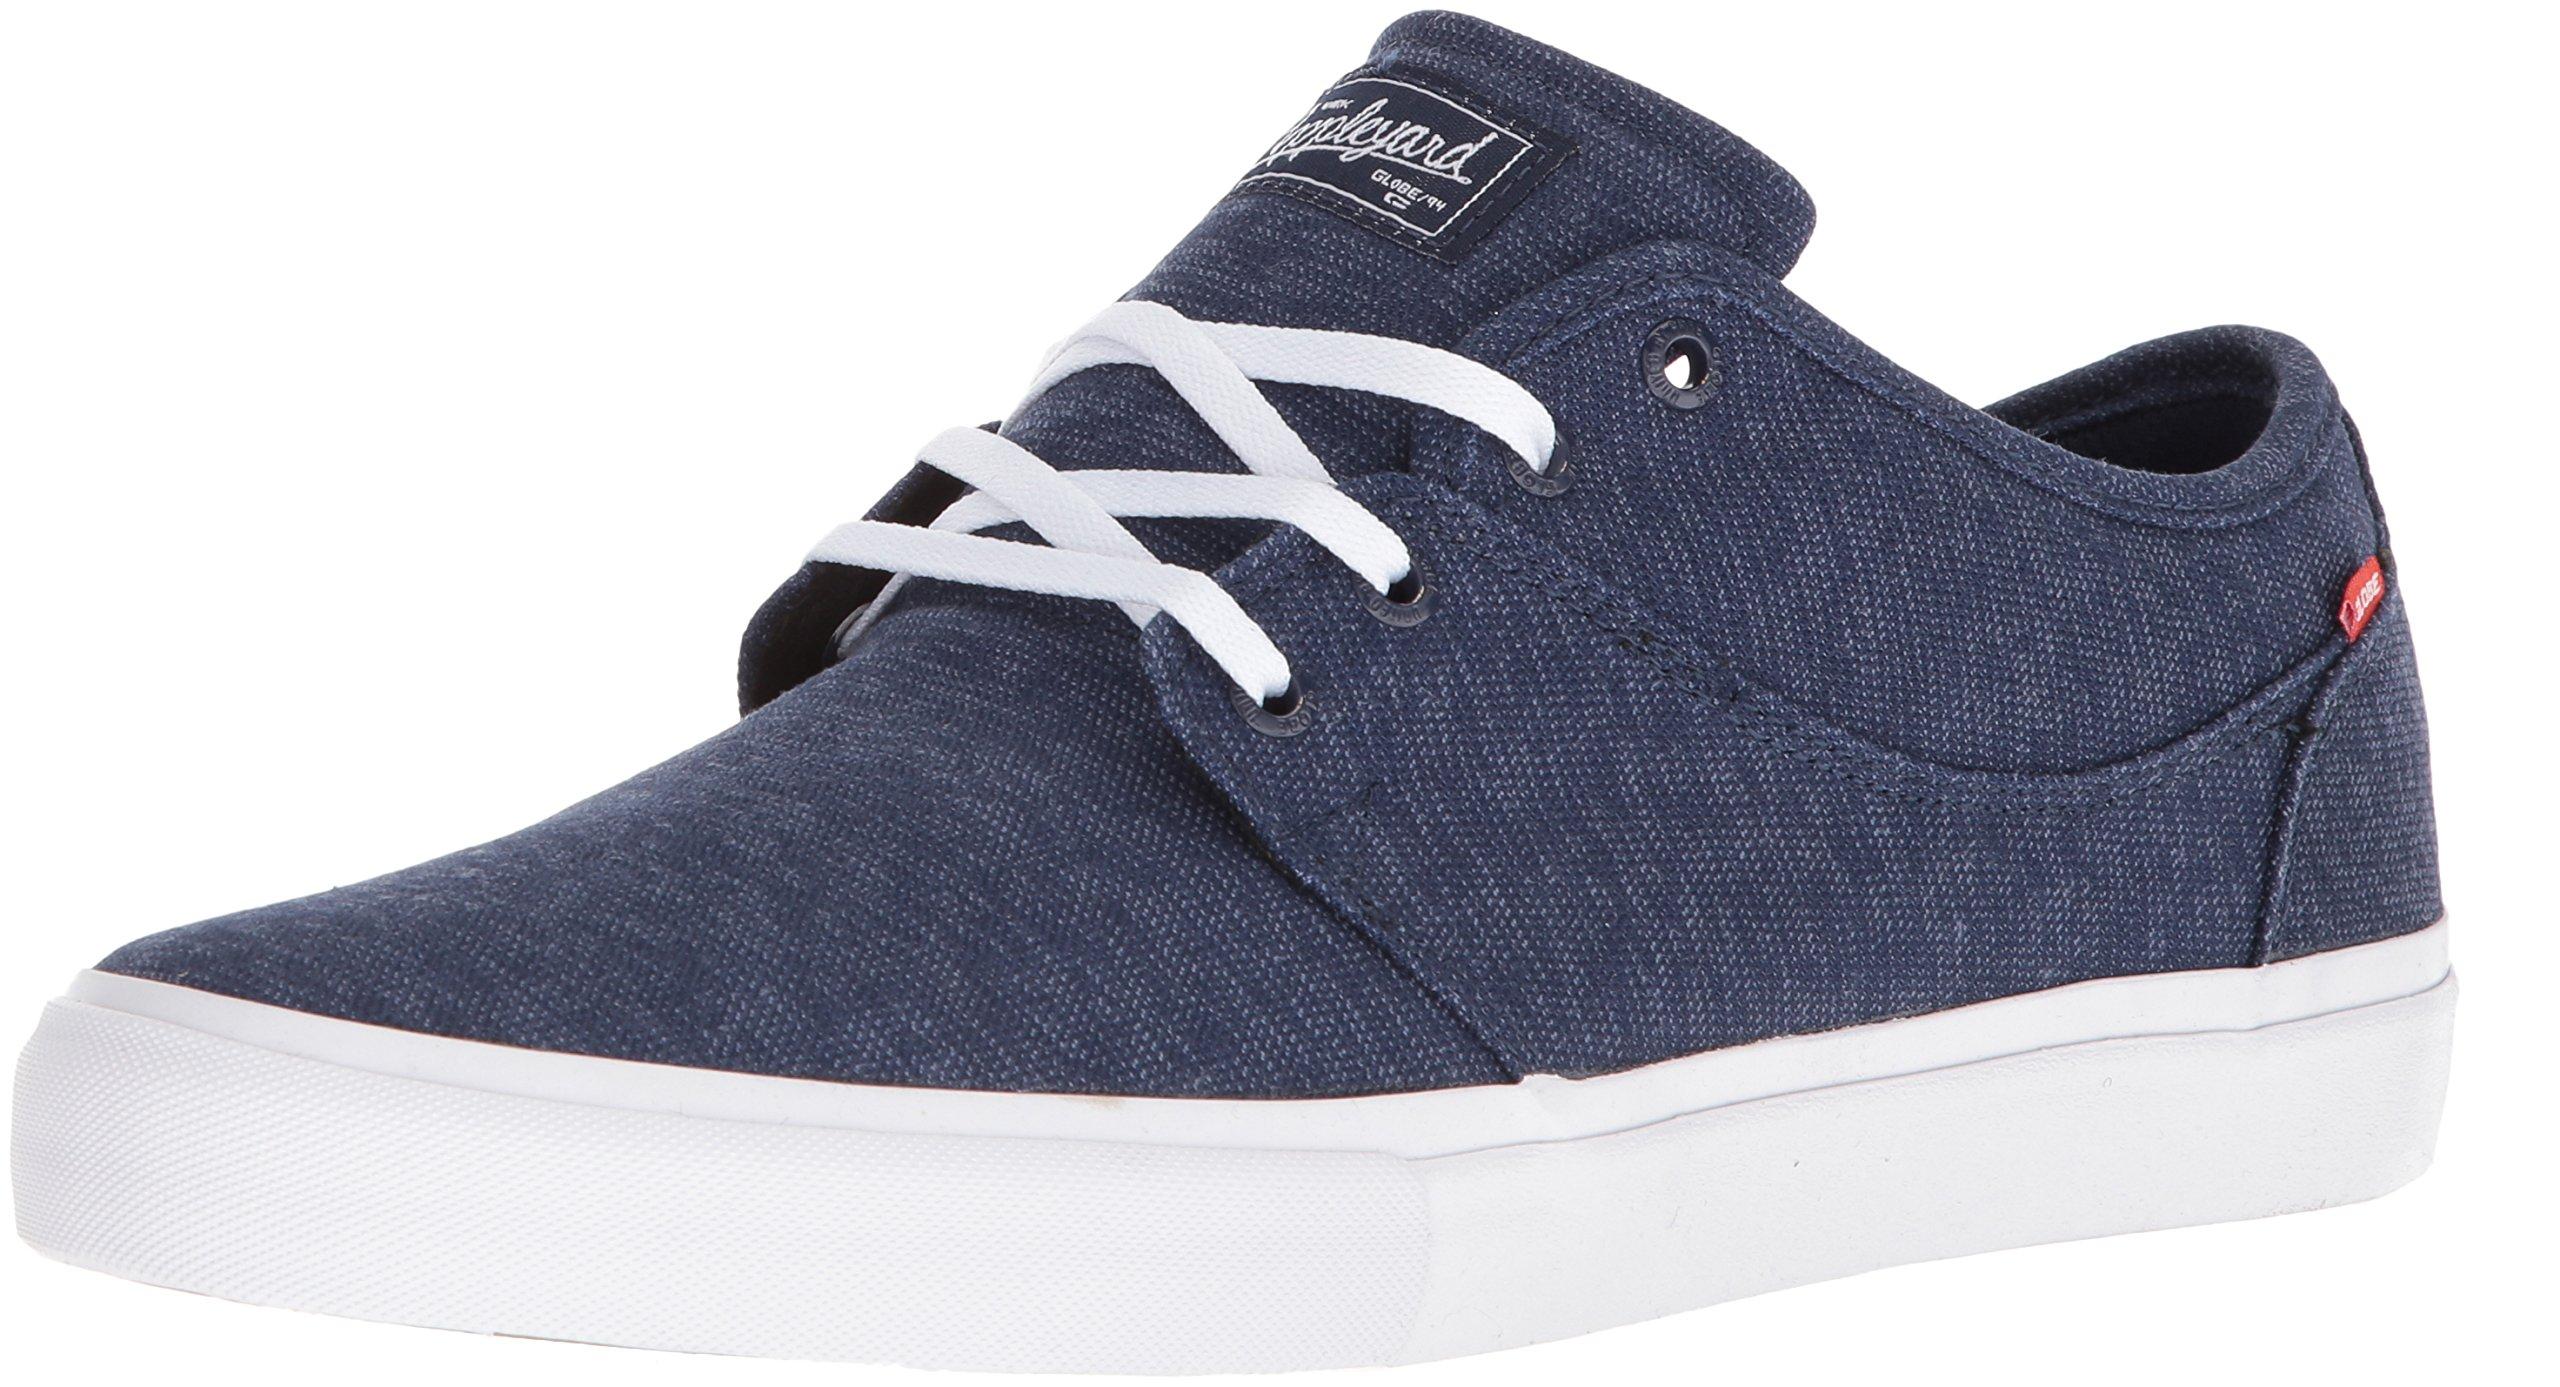 Mahalo Skate Shoe, Moonlight Blue, 10.5